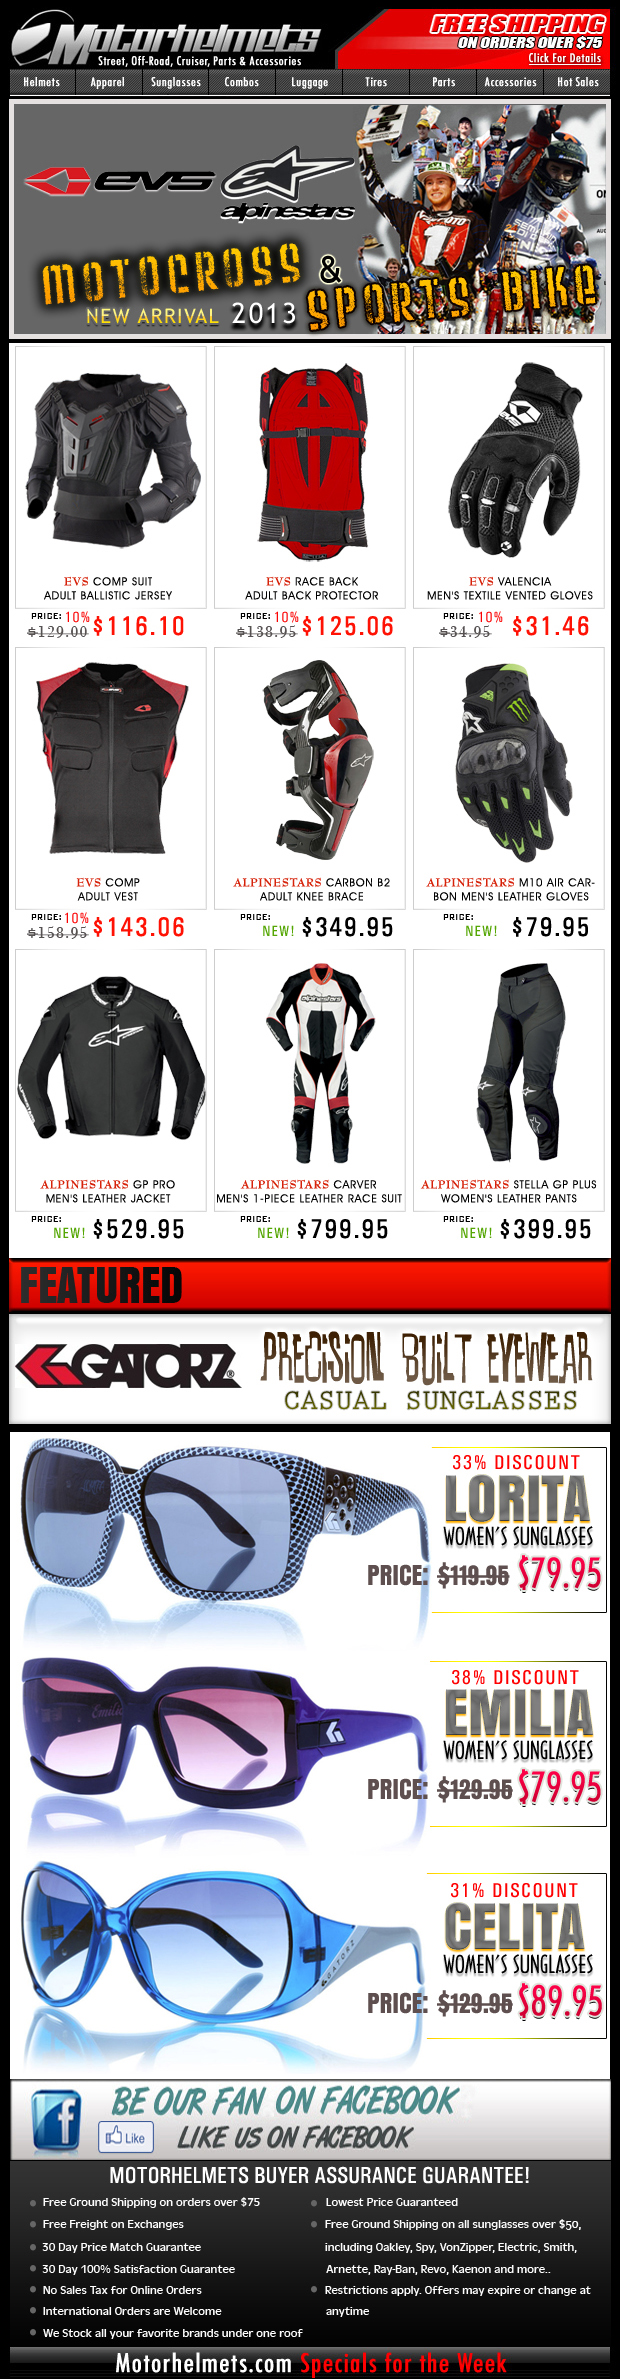 New Arrival Motorcycle Gear from EVS/Alpinestars + Gatorz Eyewear Closeouts!